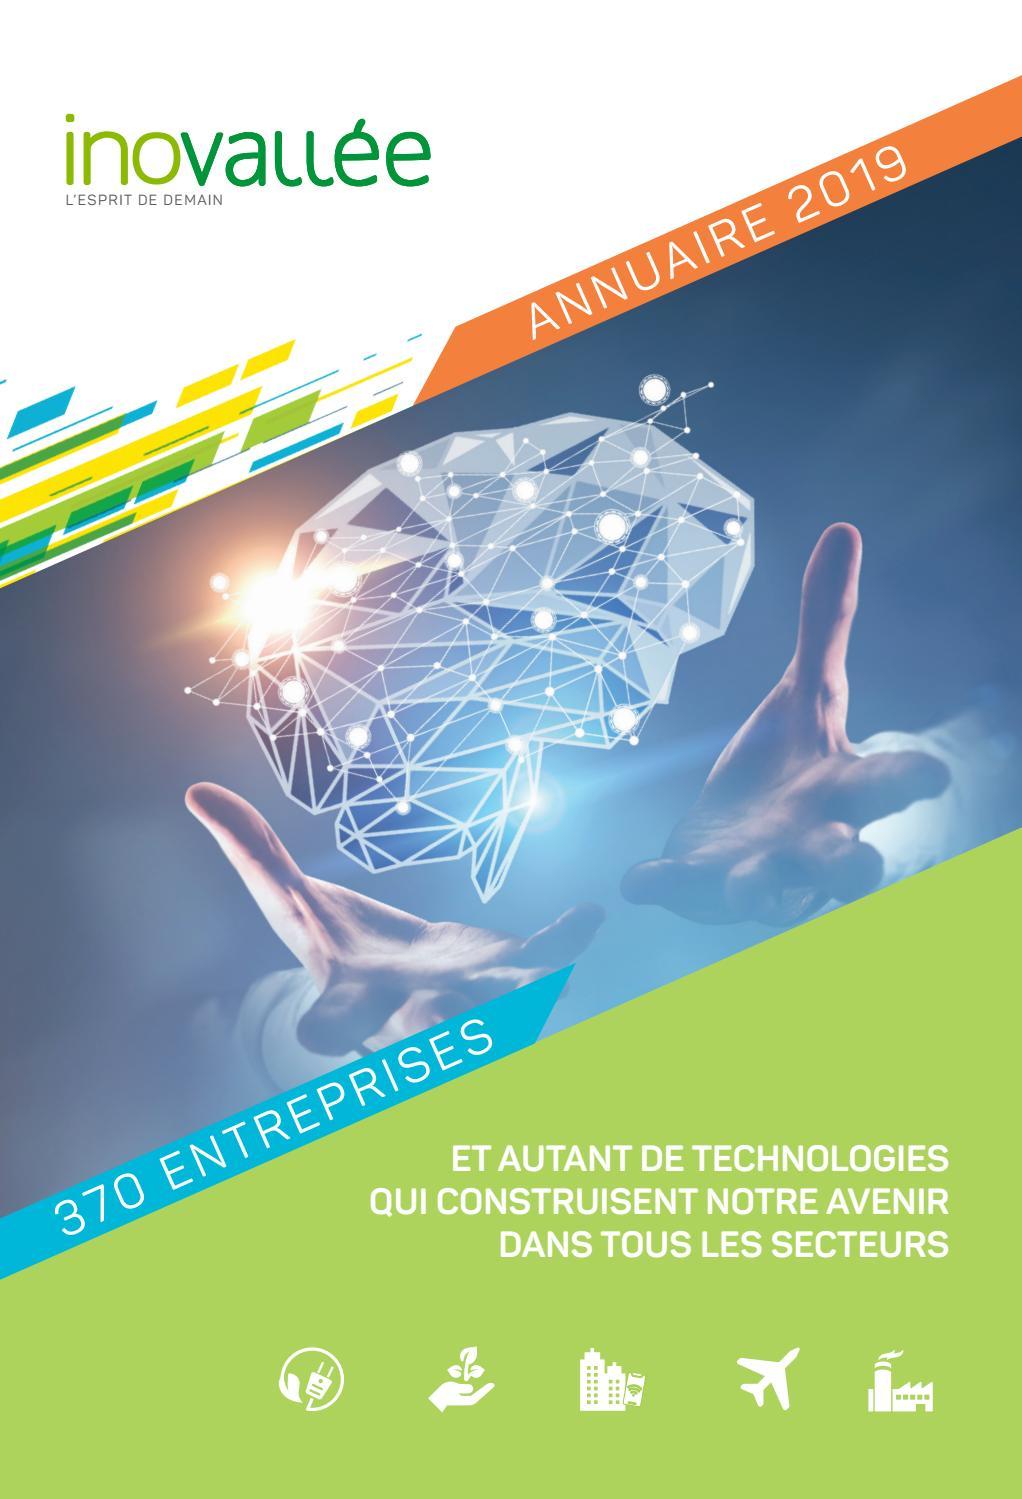 Bertrand Issuu Entreprises Valérie 2019 Des By Annuaire D'inovallée D29YHIWE